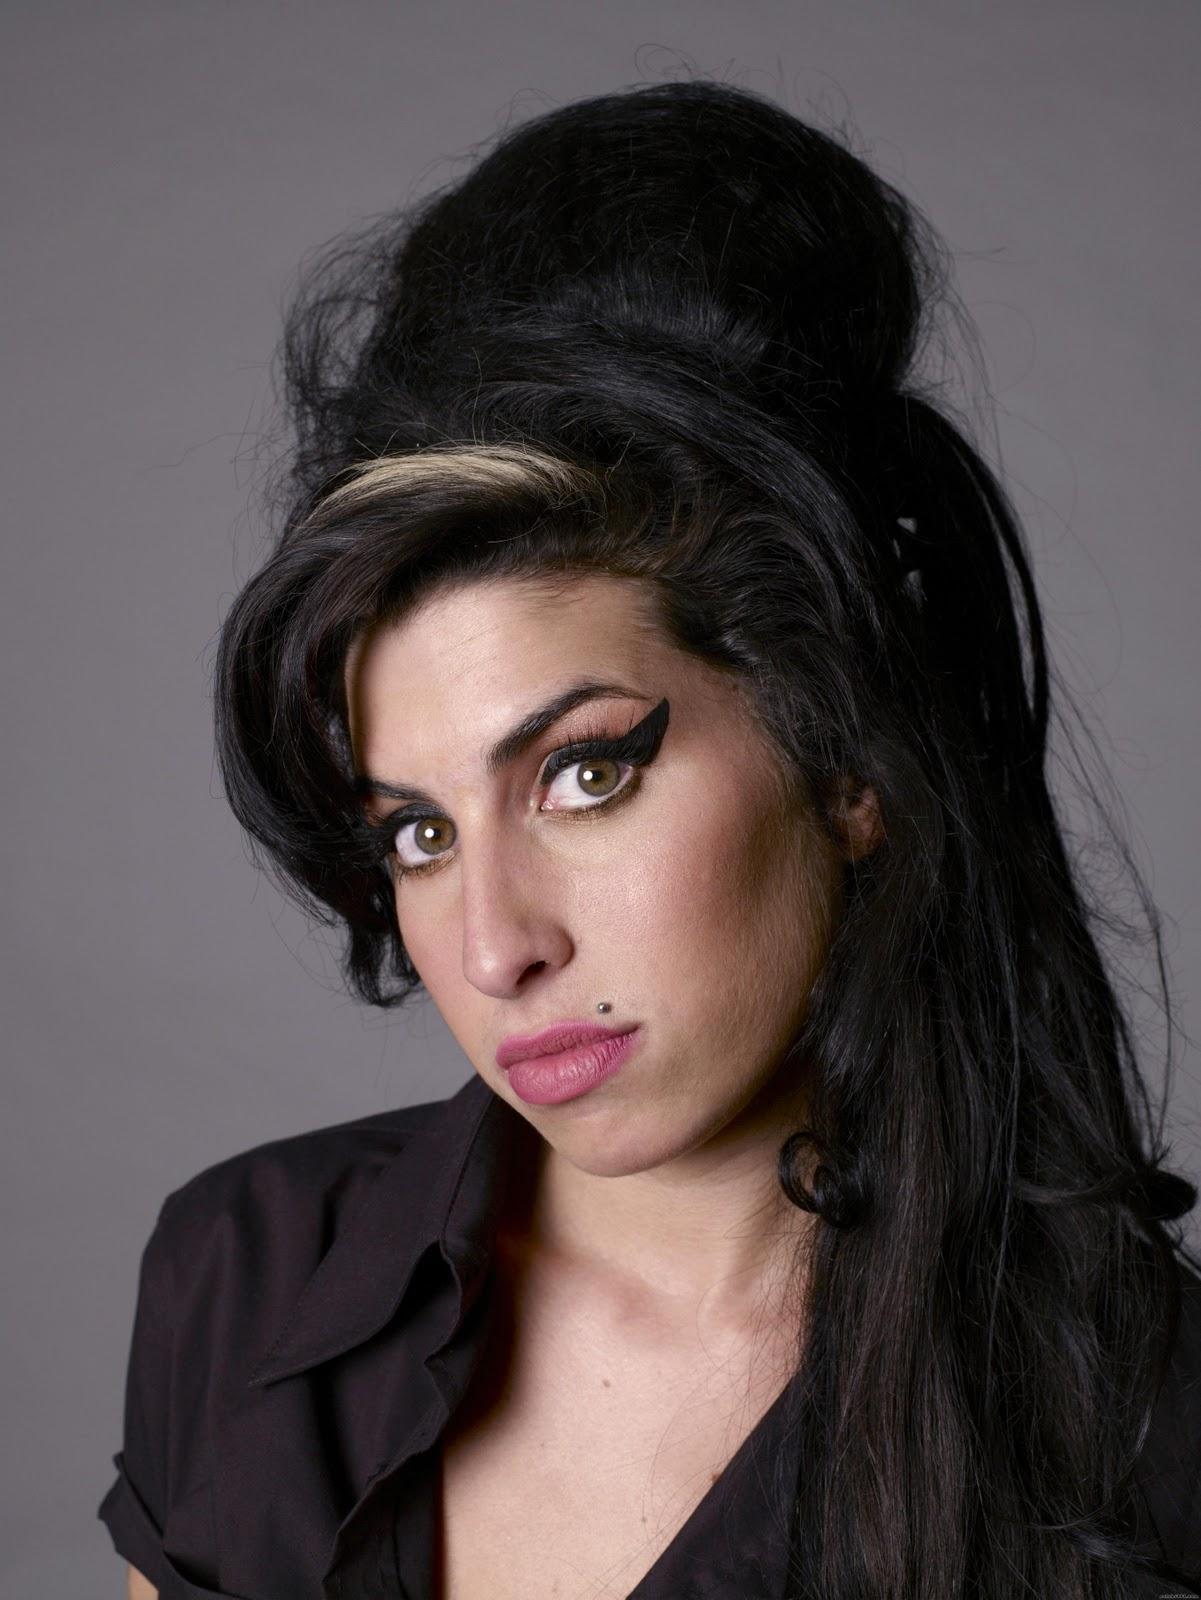 http://3.bp.blogspot.com/-8jCqk_RGZuA/Ttlux2KfeFI/AAAAAAAAAiE/oKolfxtd40k/s1600/Amy-Winehouse-wallpaper-4.jpg